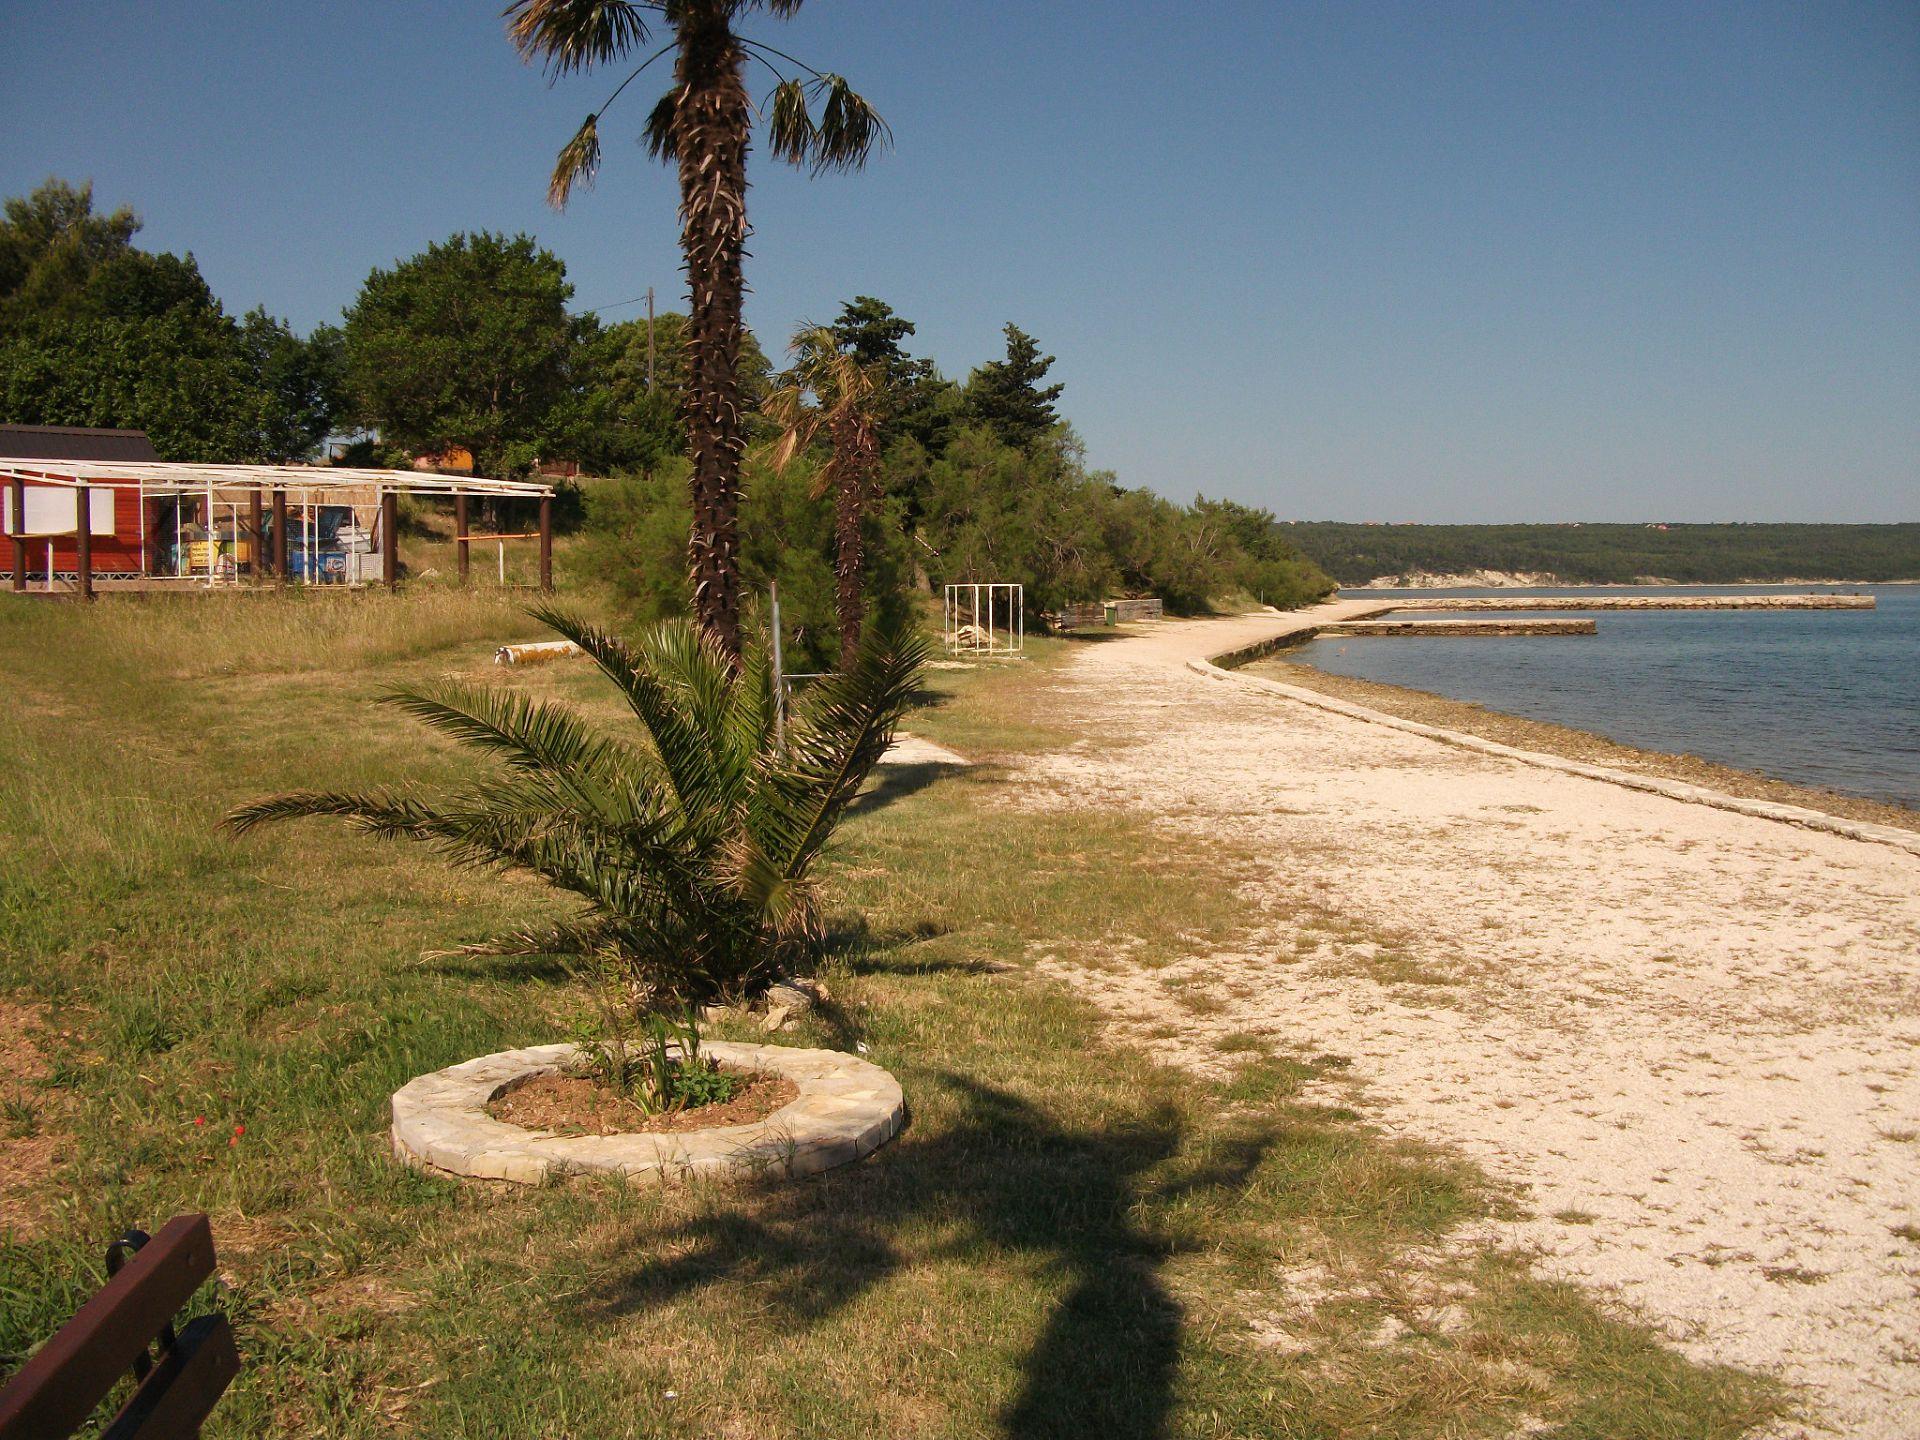 Ferienwohnung Dusko A1(2+3) - Gornji Karin (802127), Obrovac, , Dalmatien, Kroatien, Bild 10